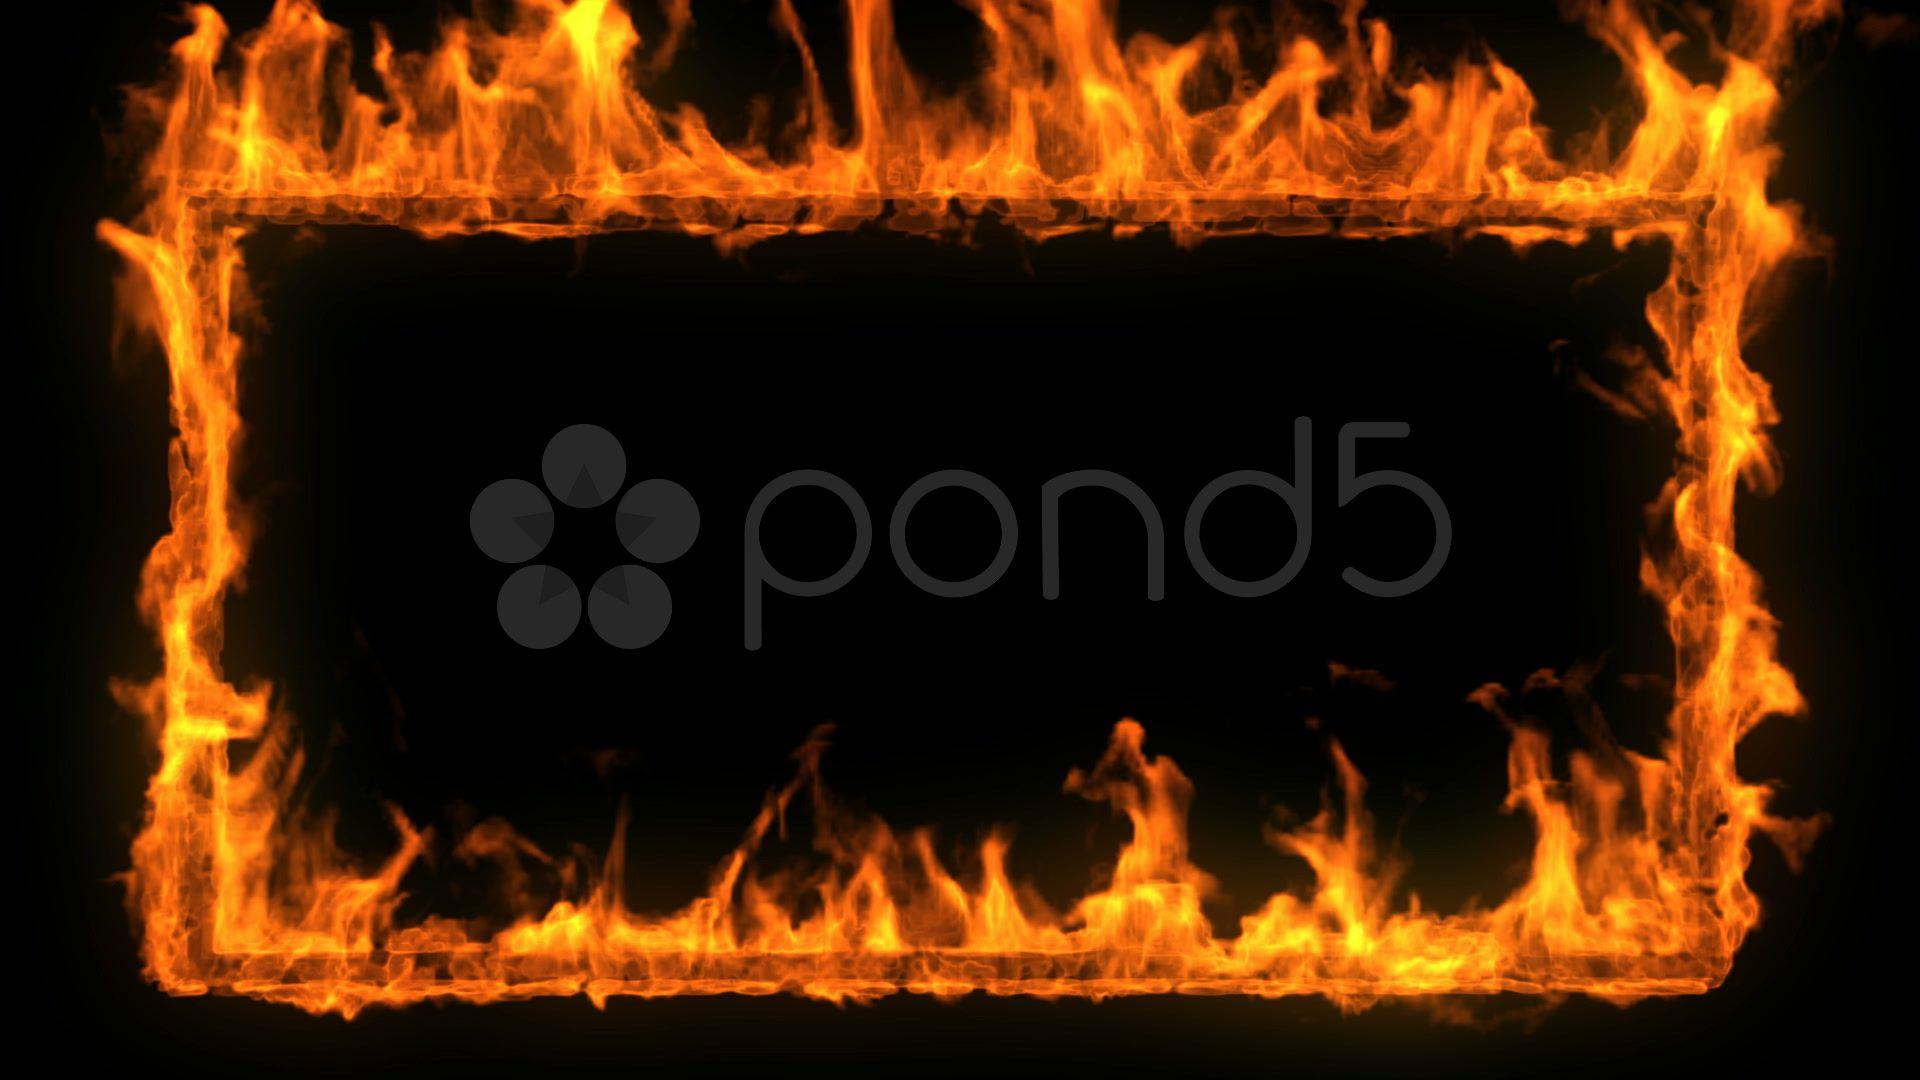 Burning Frame Flame Border Stock Footage Flame Frame Burning Footage Photoshop Vector Images Image